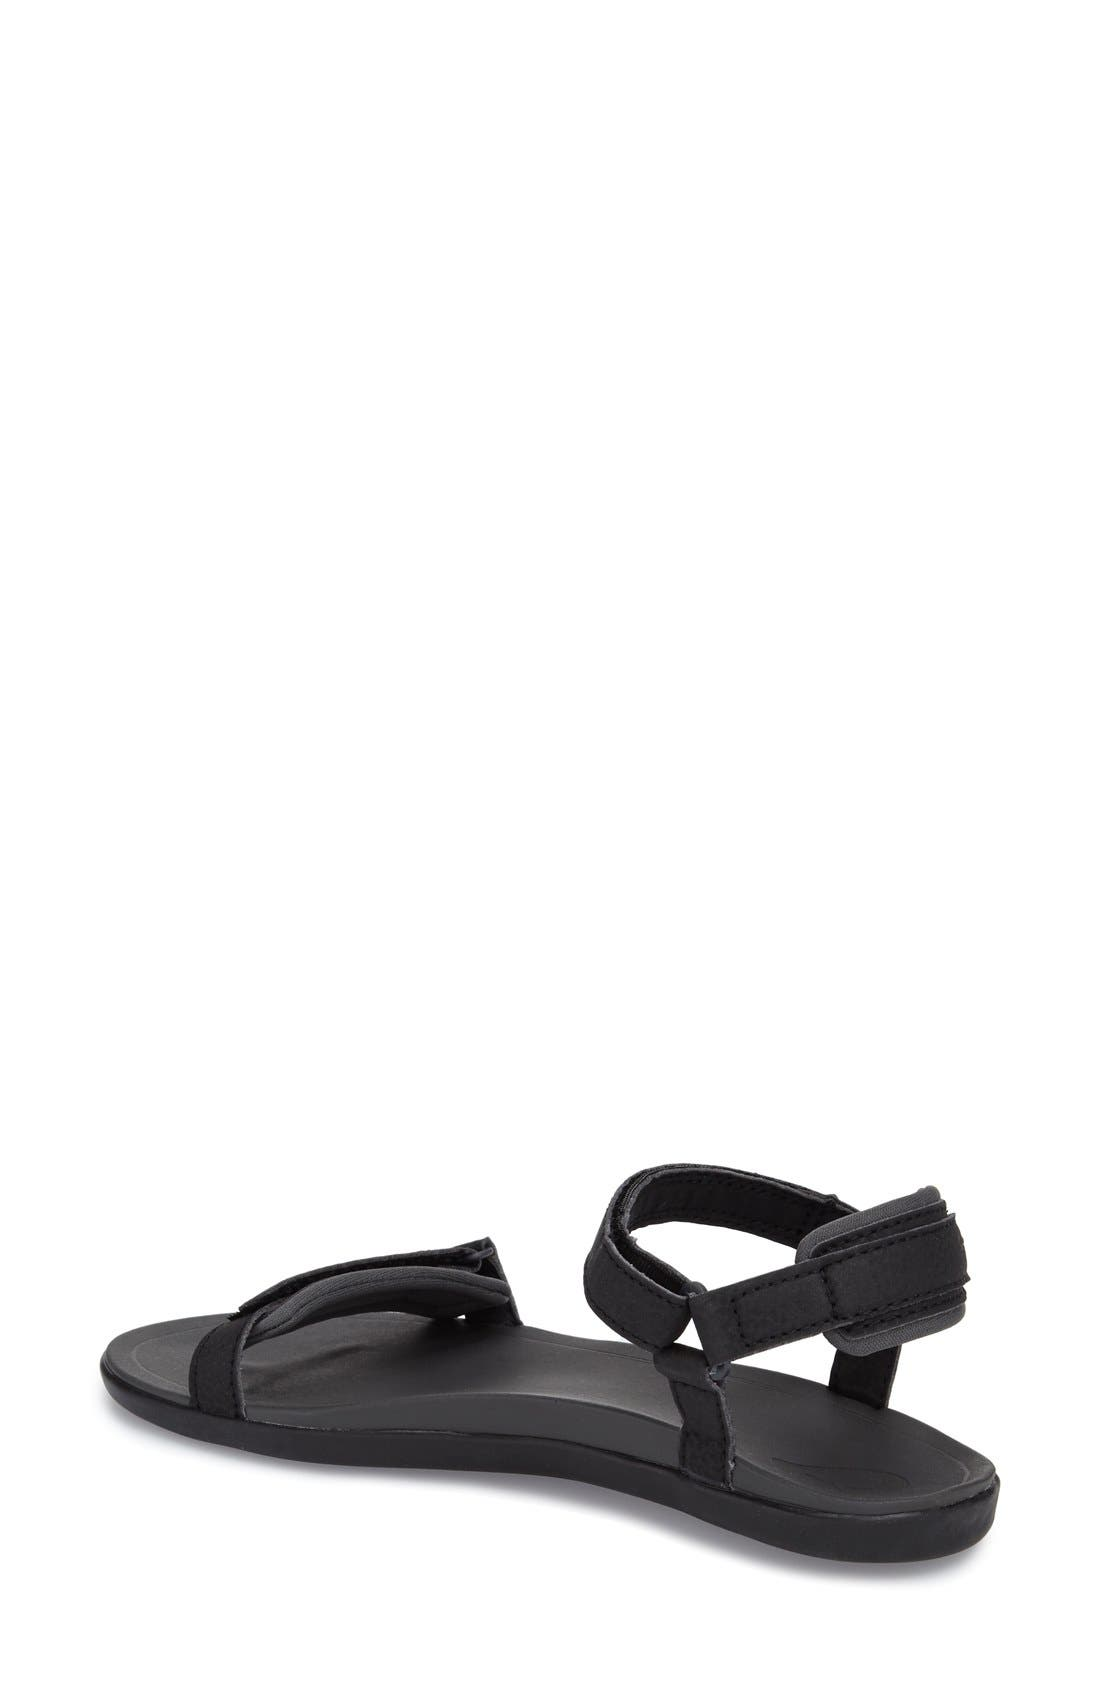 'Luana' Sandal,                             Alternate thumbnail 2, color,                             Black Faux Leather